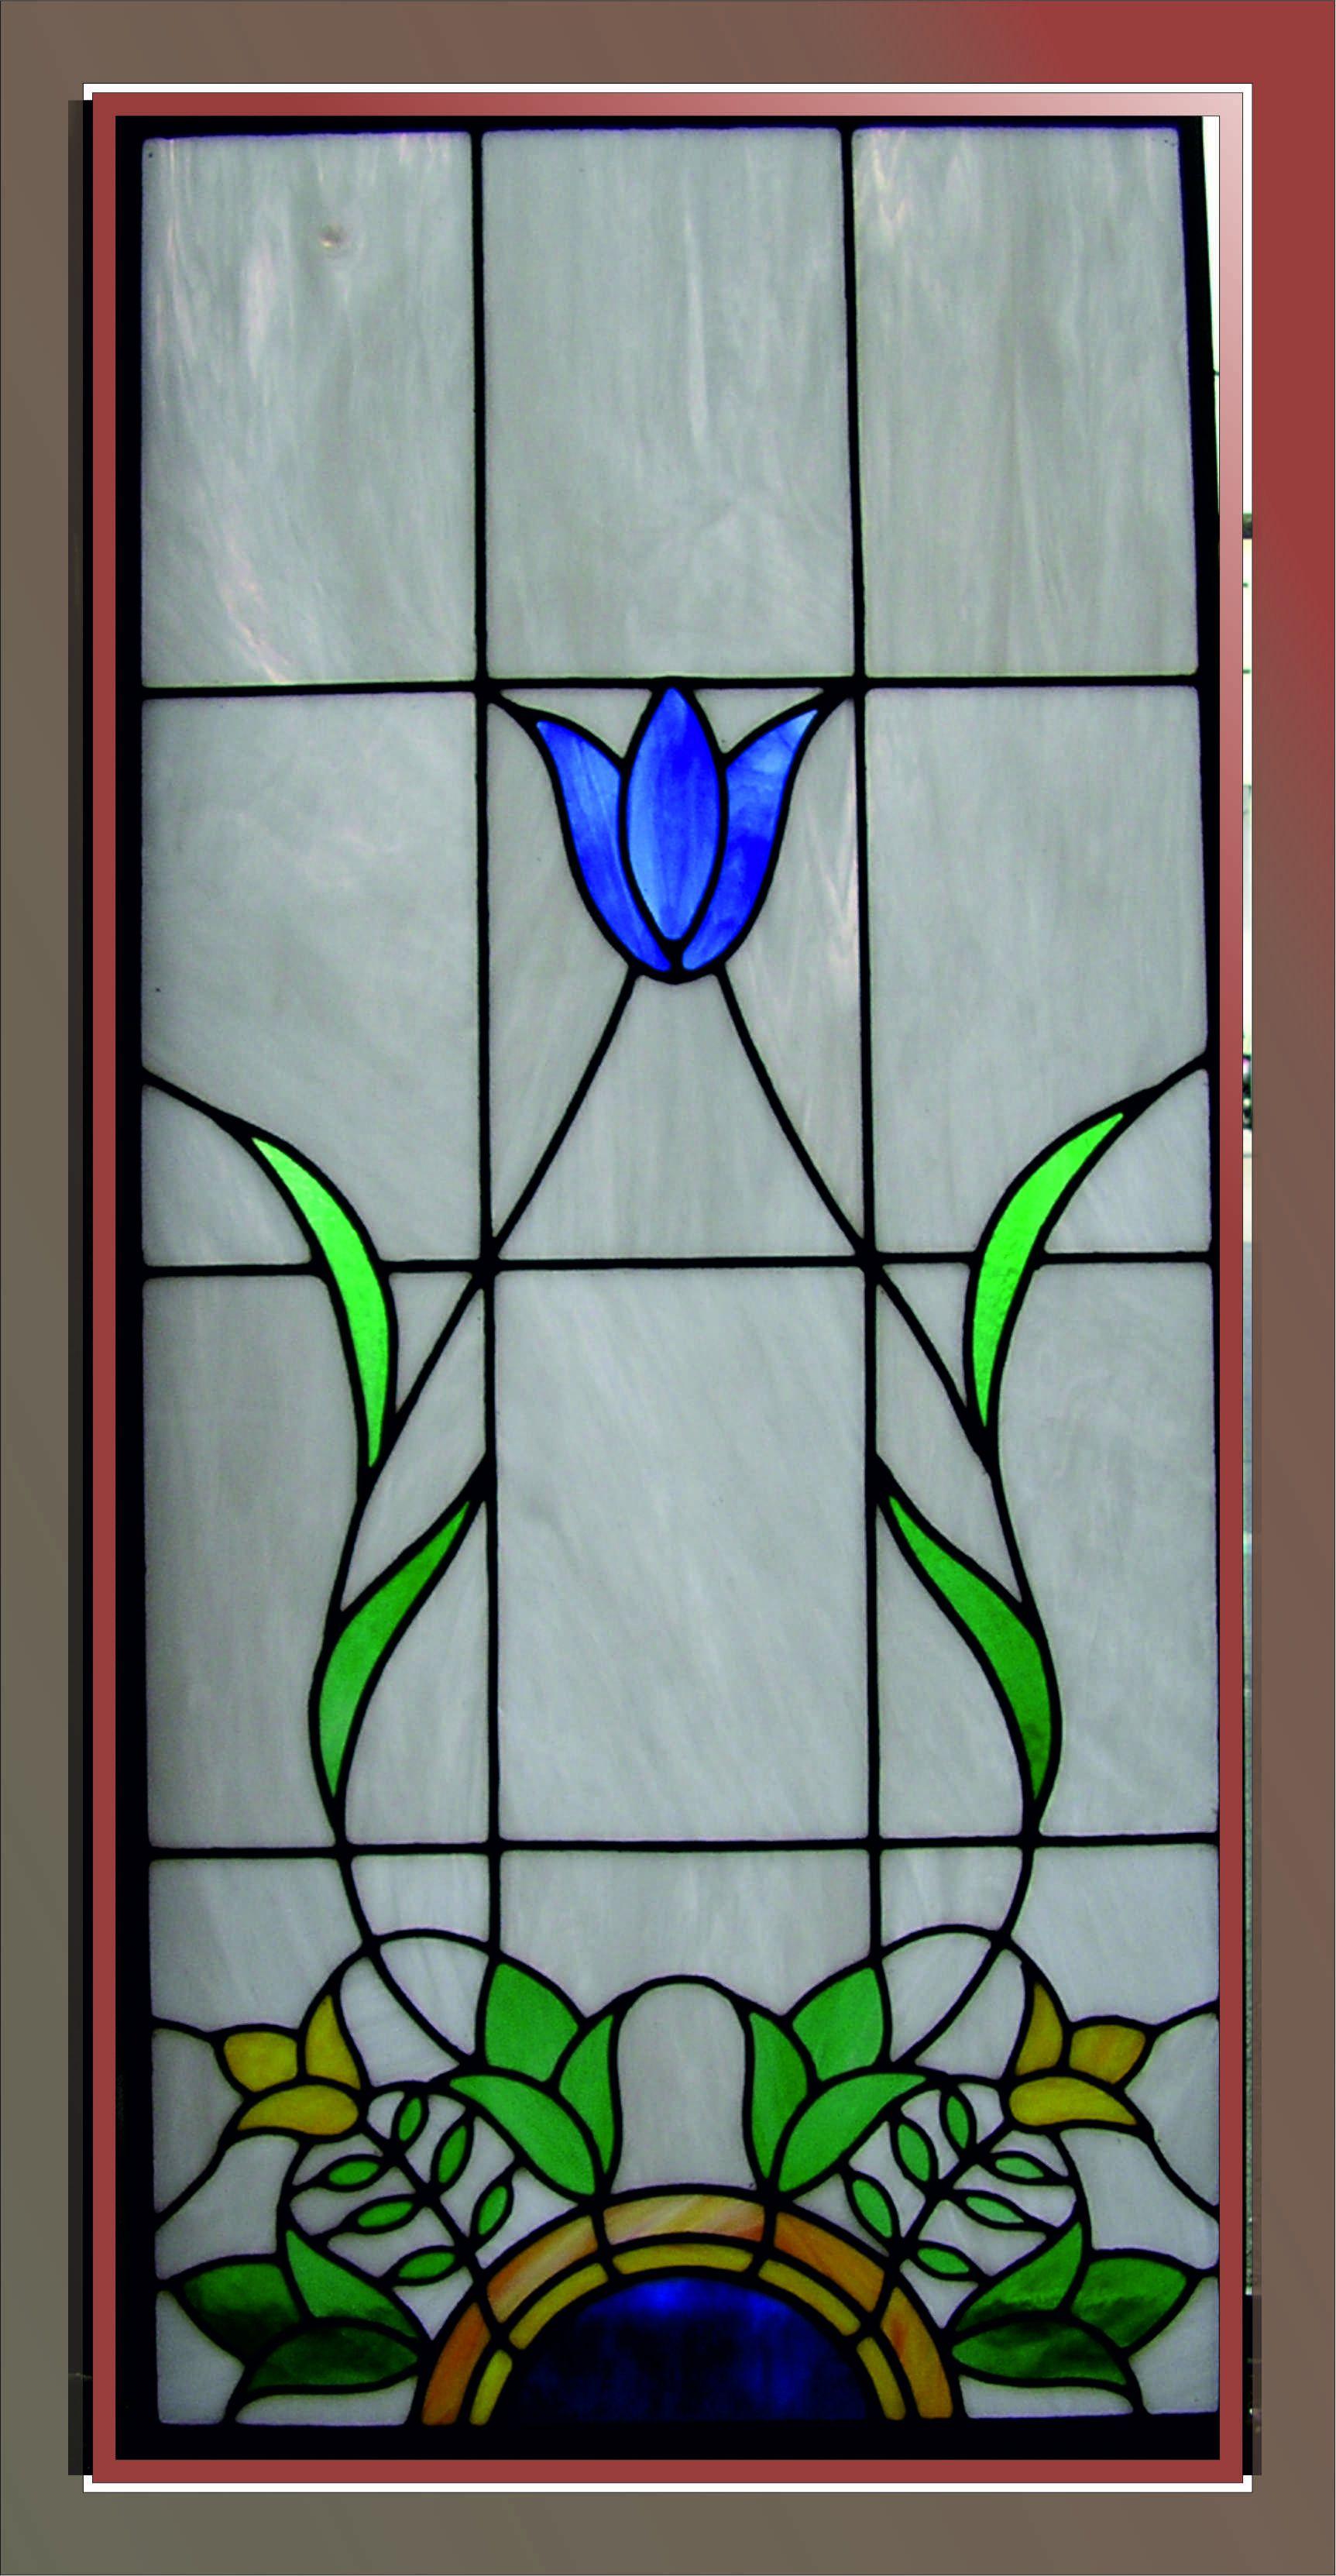 Vetrata artistica rilegata a piombo - vetrate artistiche rilegate a ...